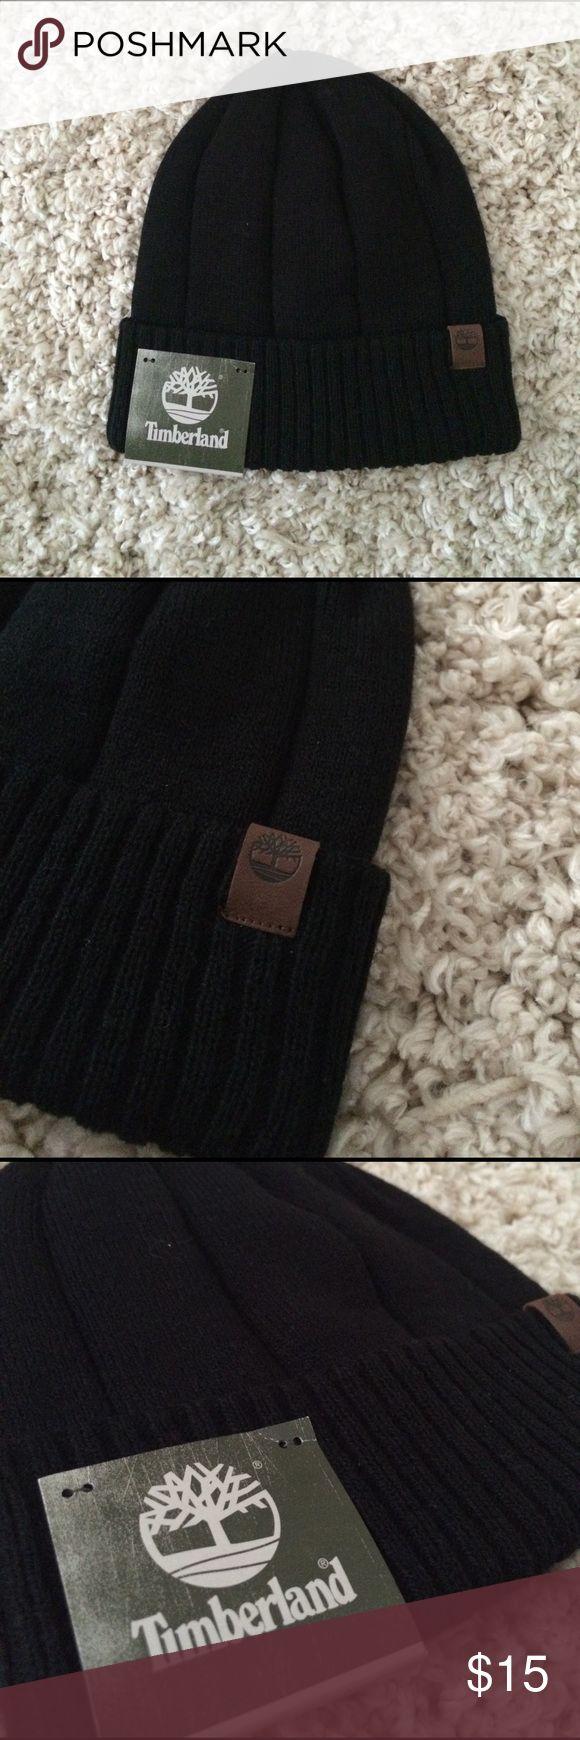 Timberland BNWT black hat Brand new Timberland hat! Super nice. Timberland Accessories Hats